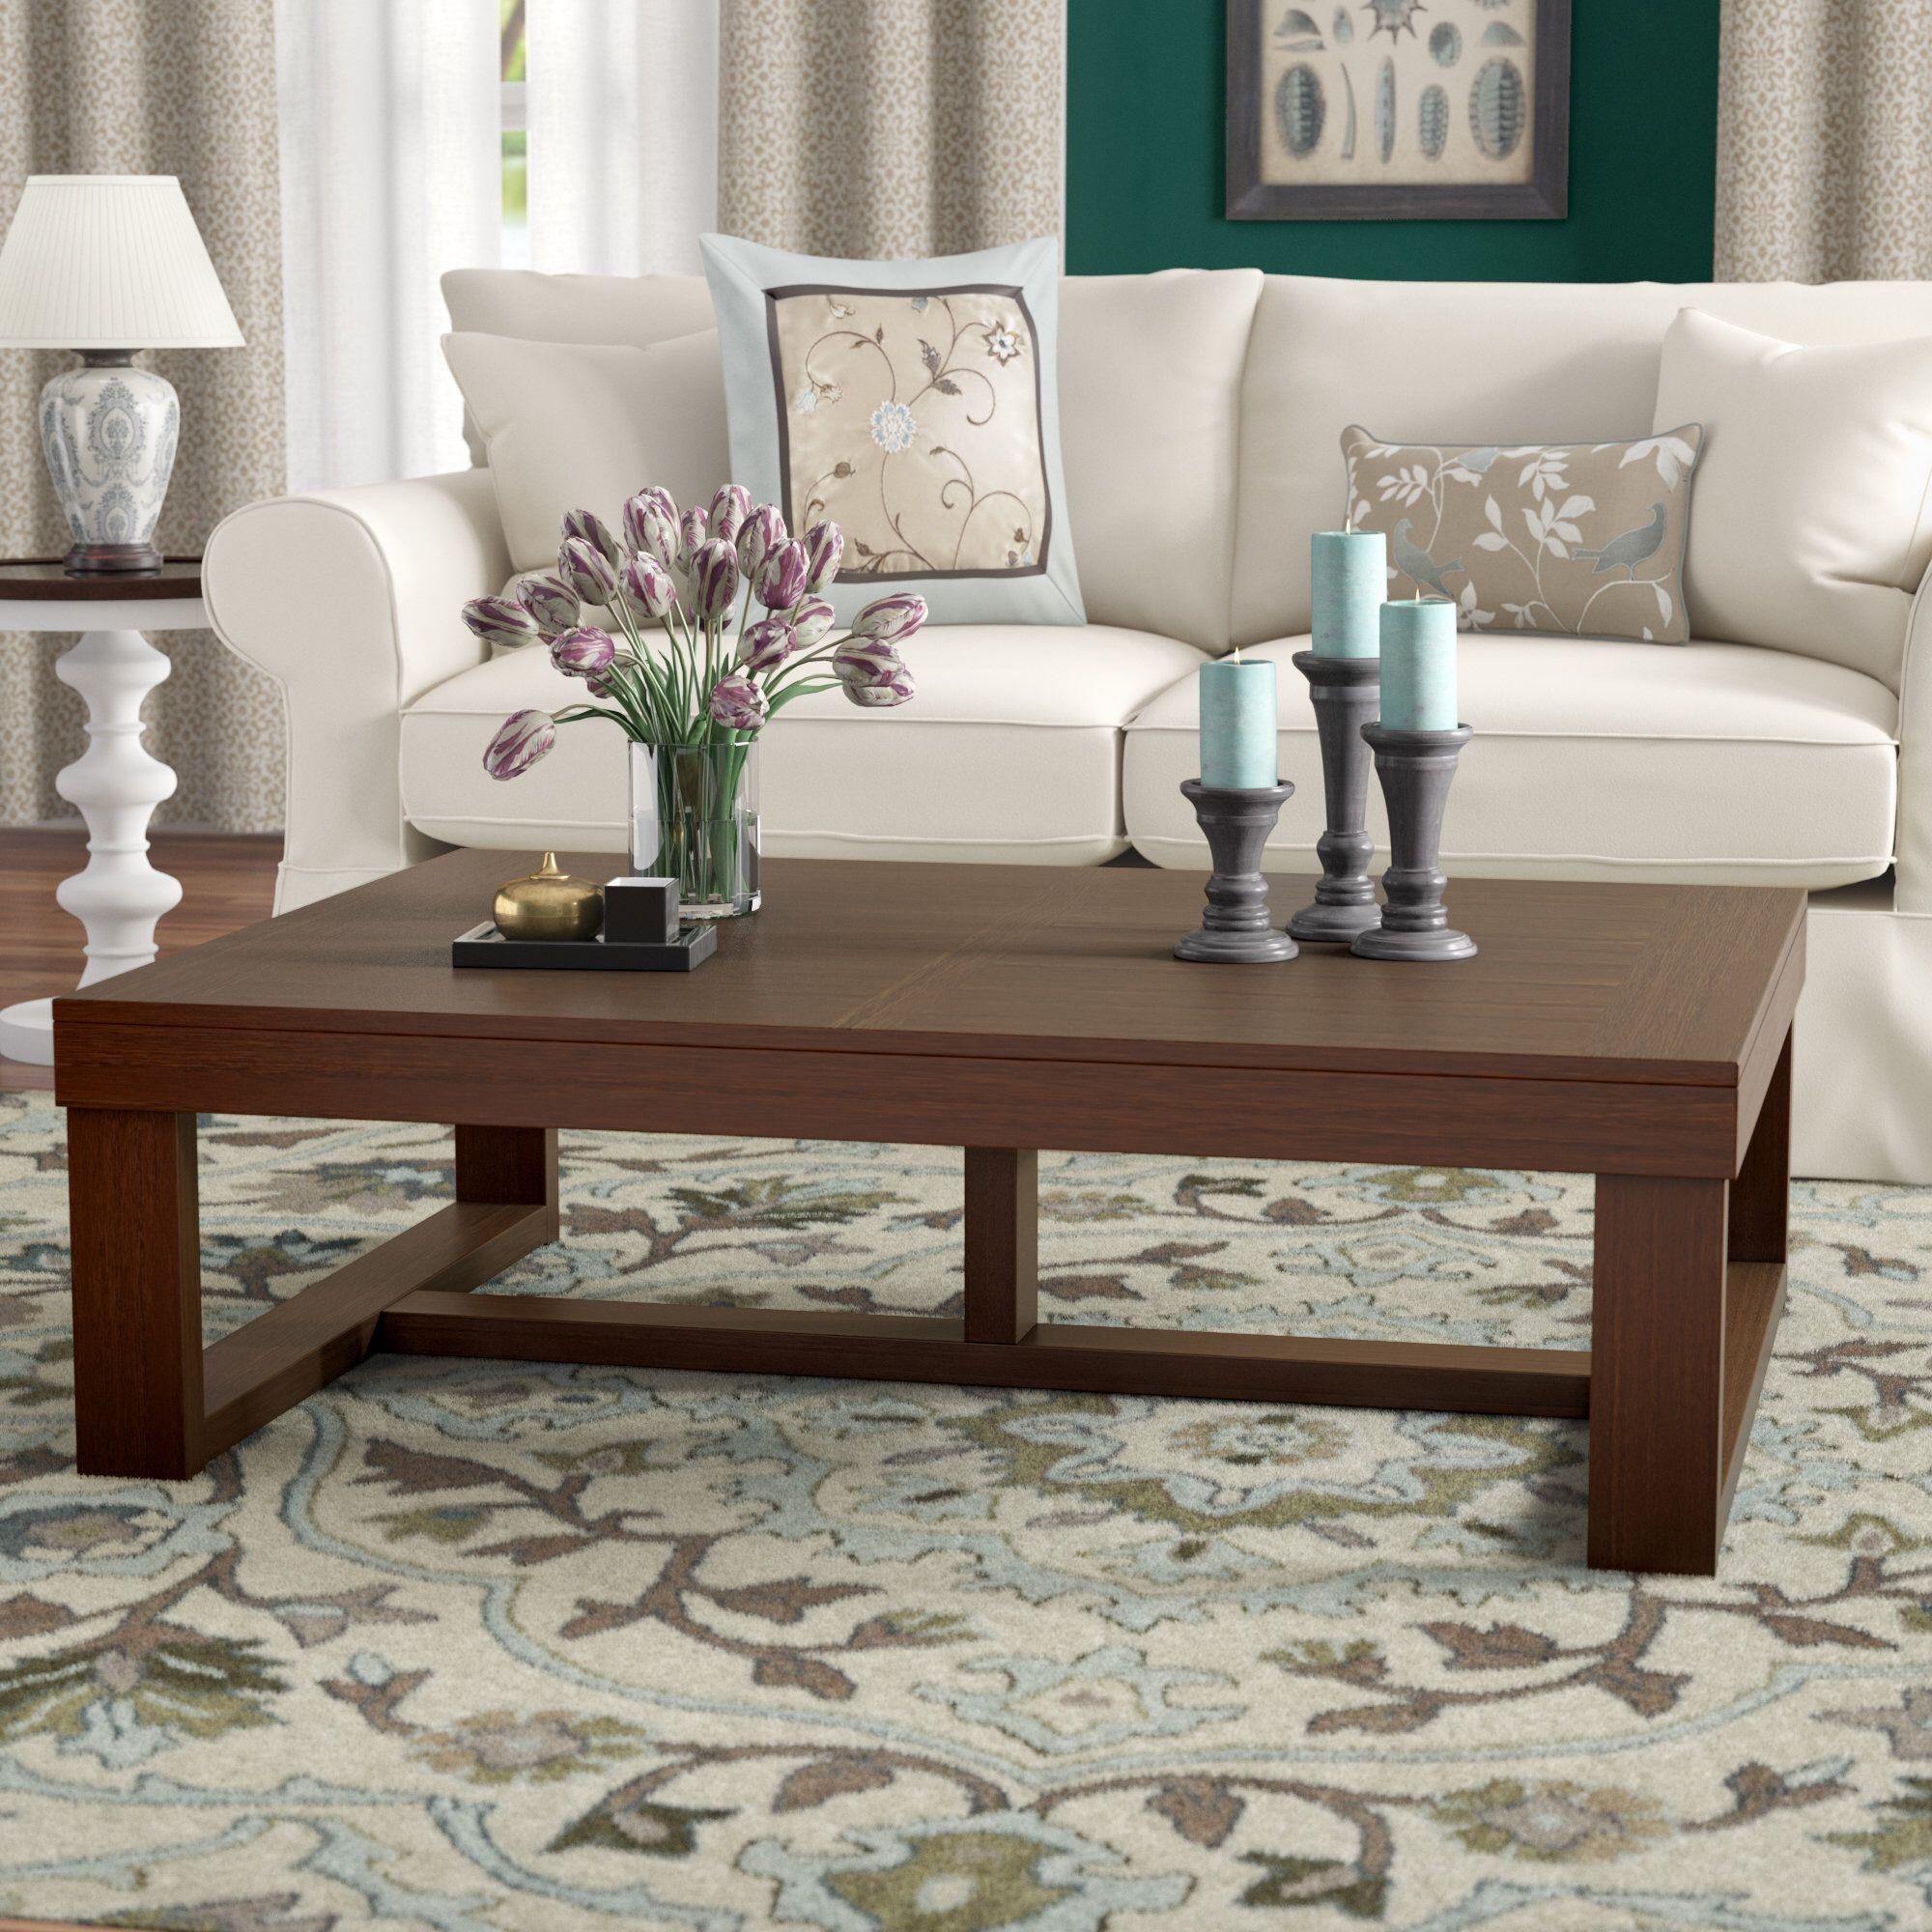 Cranmore Coffee Table Coffee Table Elegant Home Decor Coffee Table Rectangle [ 2000 x 2000 Pixel ]